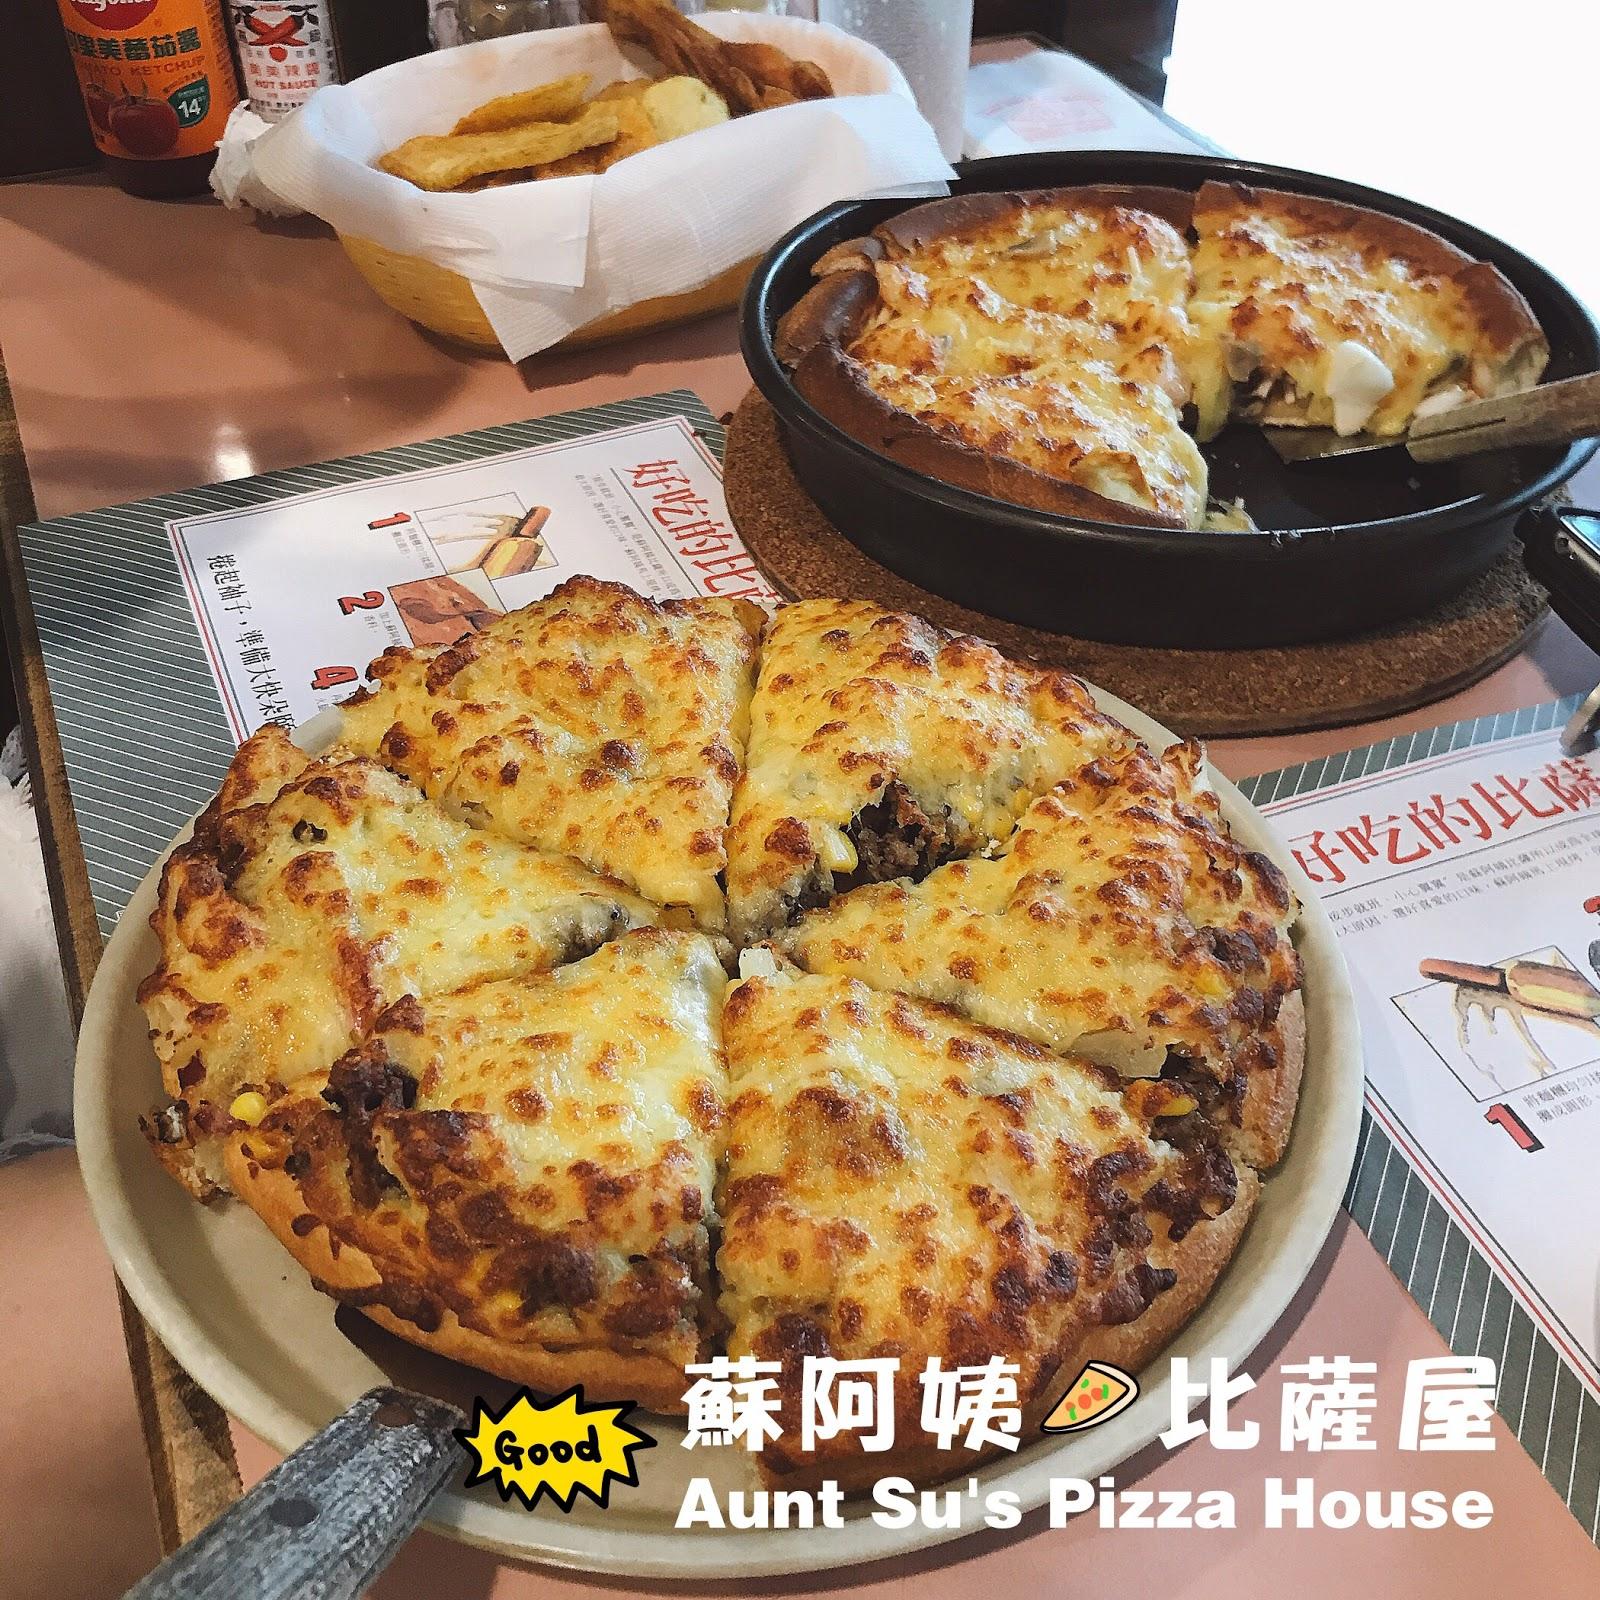 大安 - 蘇阿姨比薩屋 Aunt Su's Pizza House - 克莉絲朵 C.L.